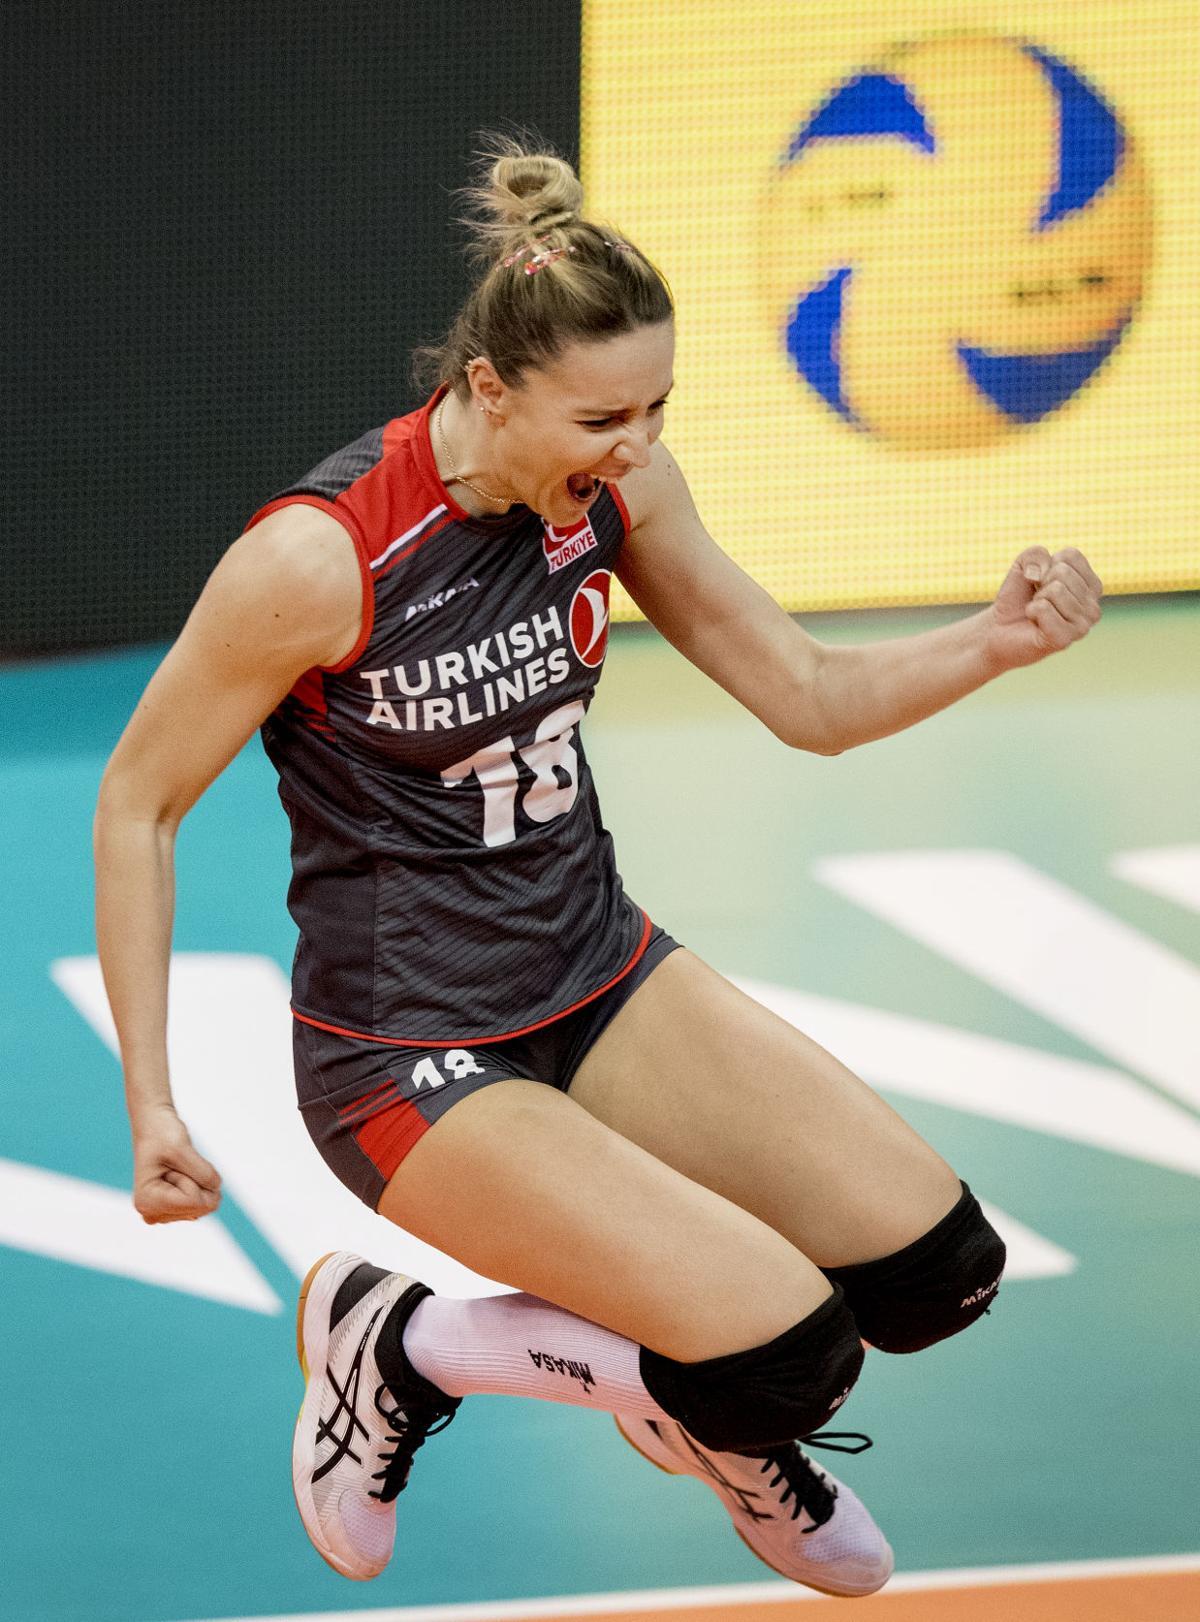 USA volleyball vs. Turkey, 5/16/18